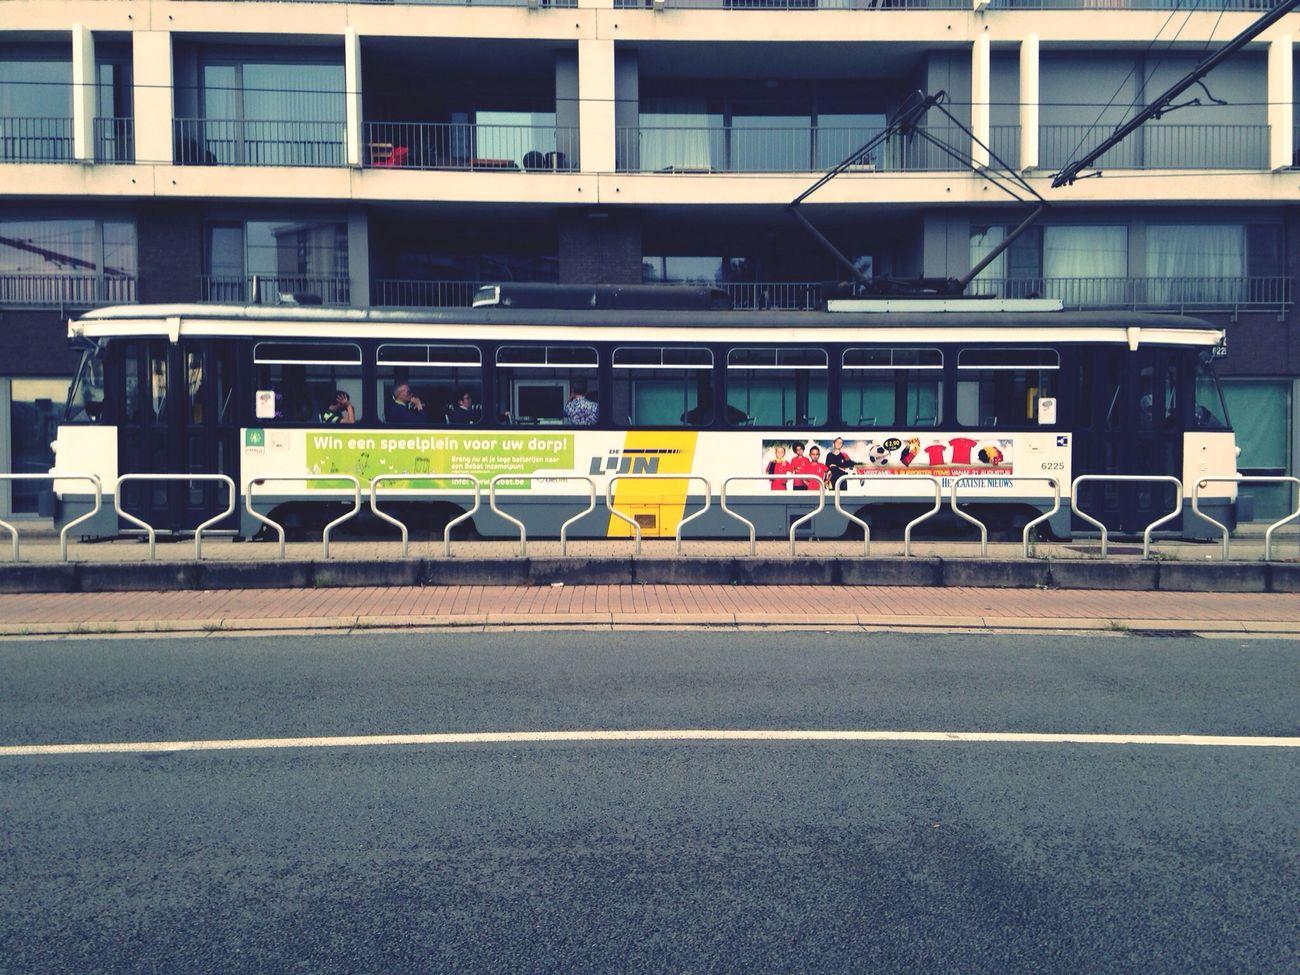 Ghent Tram Public Transportation